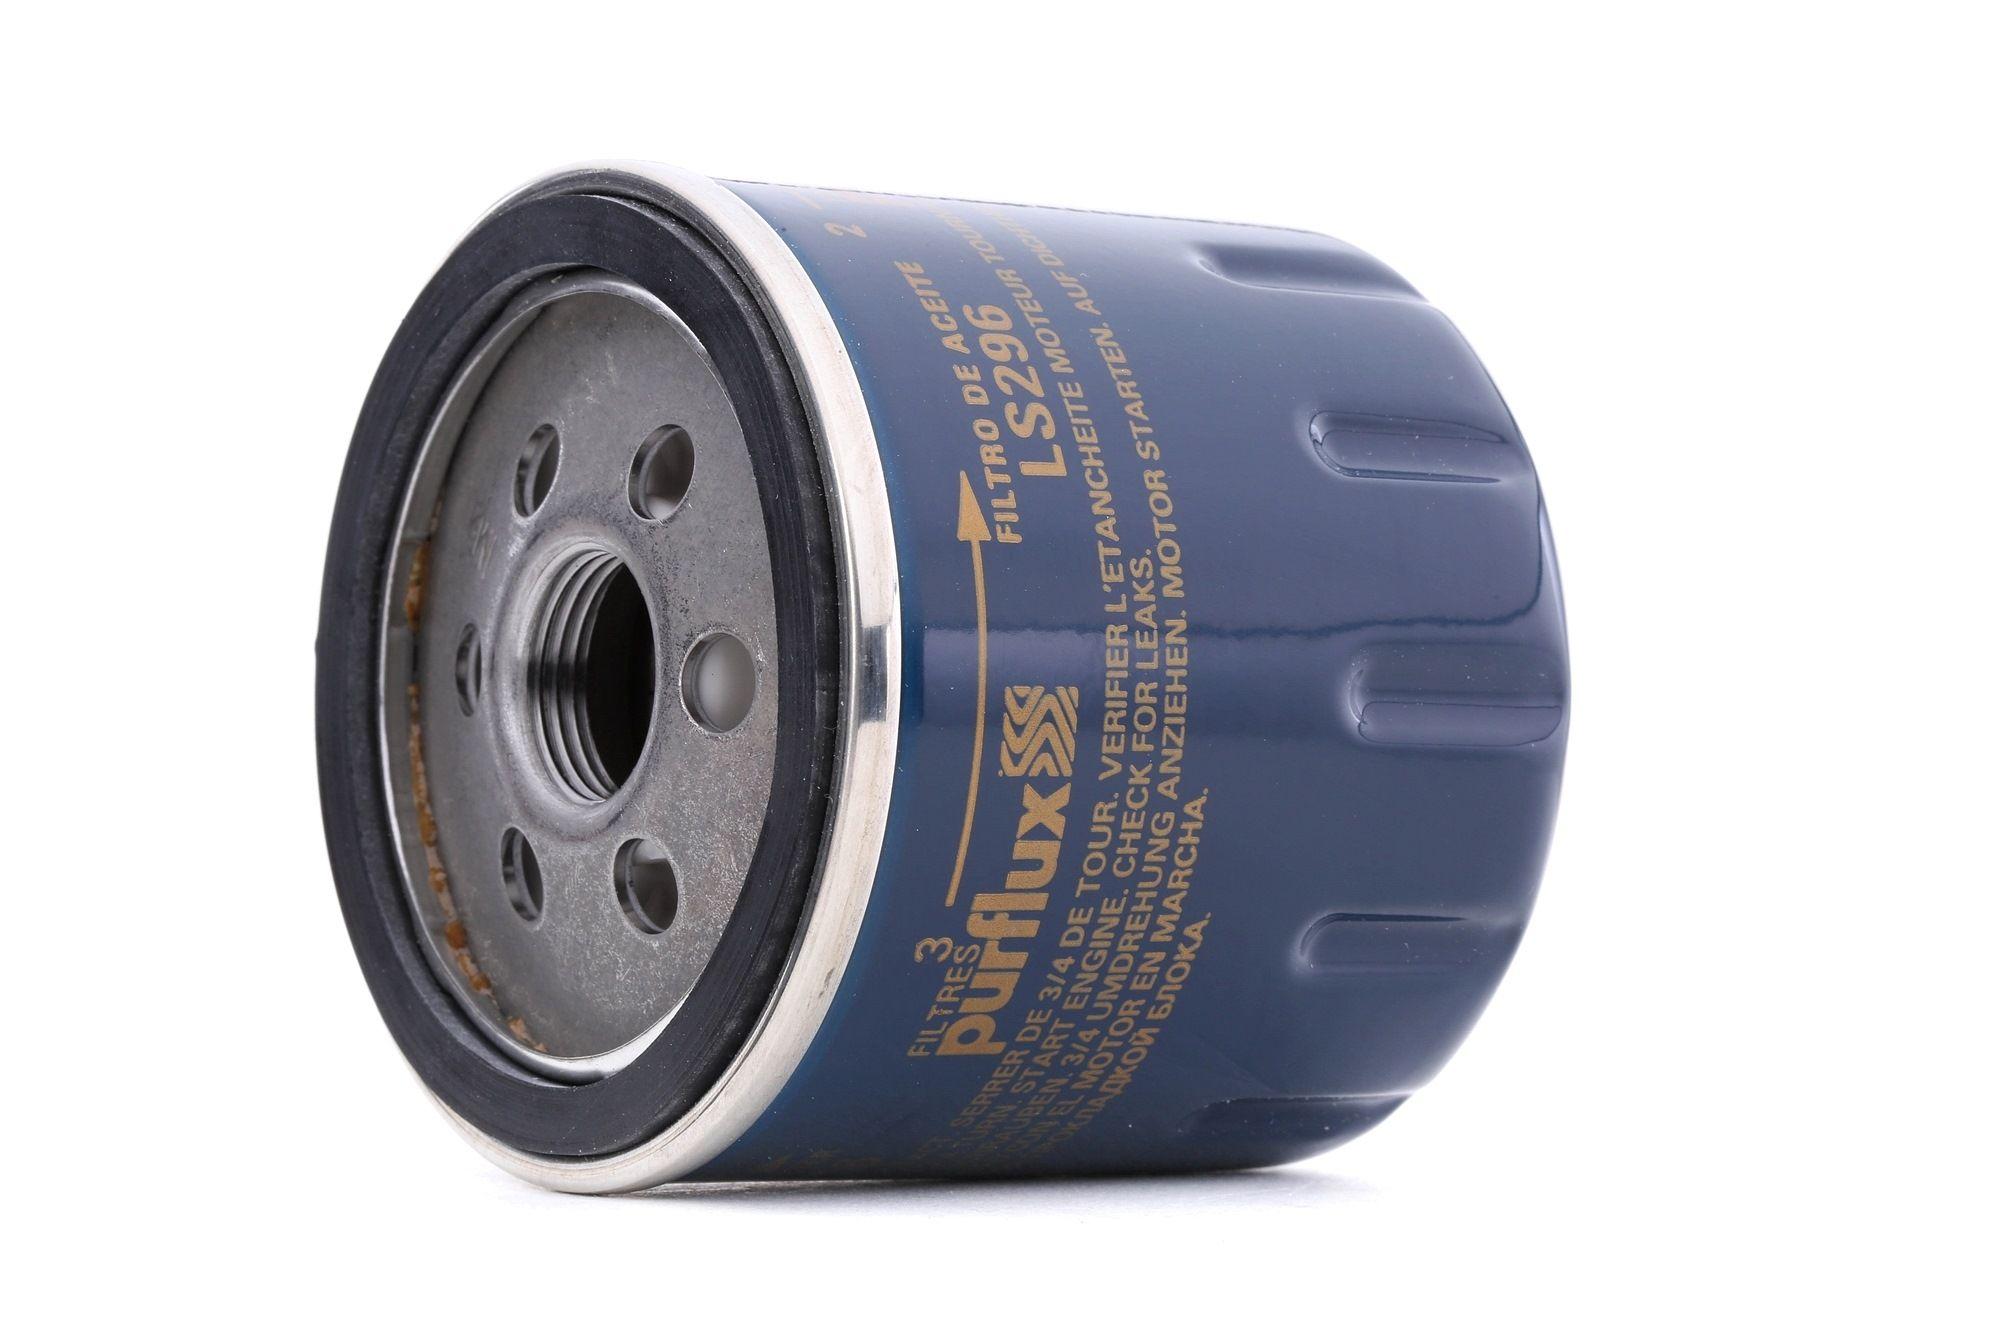 LS296 PURFLUX Anschraubfilter Ø: 76mm, Höhe: 74mm Ölfilter LS296 günstig kaufen